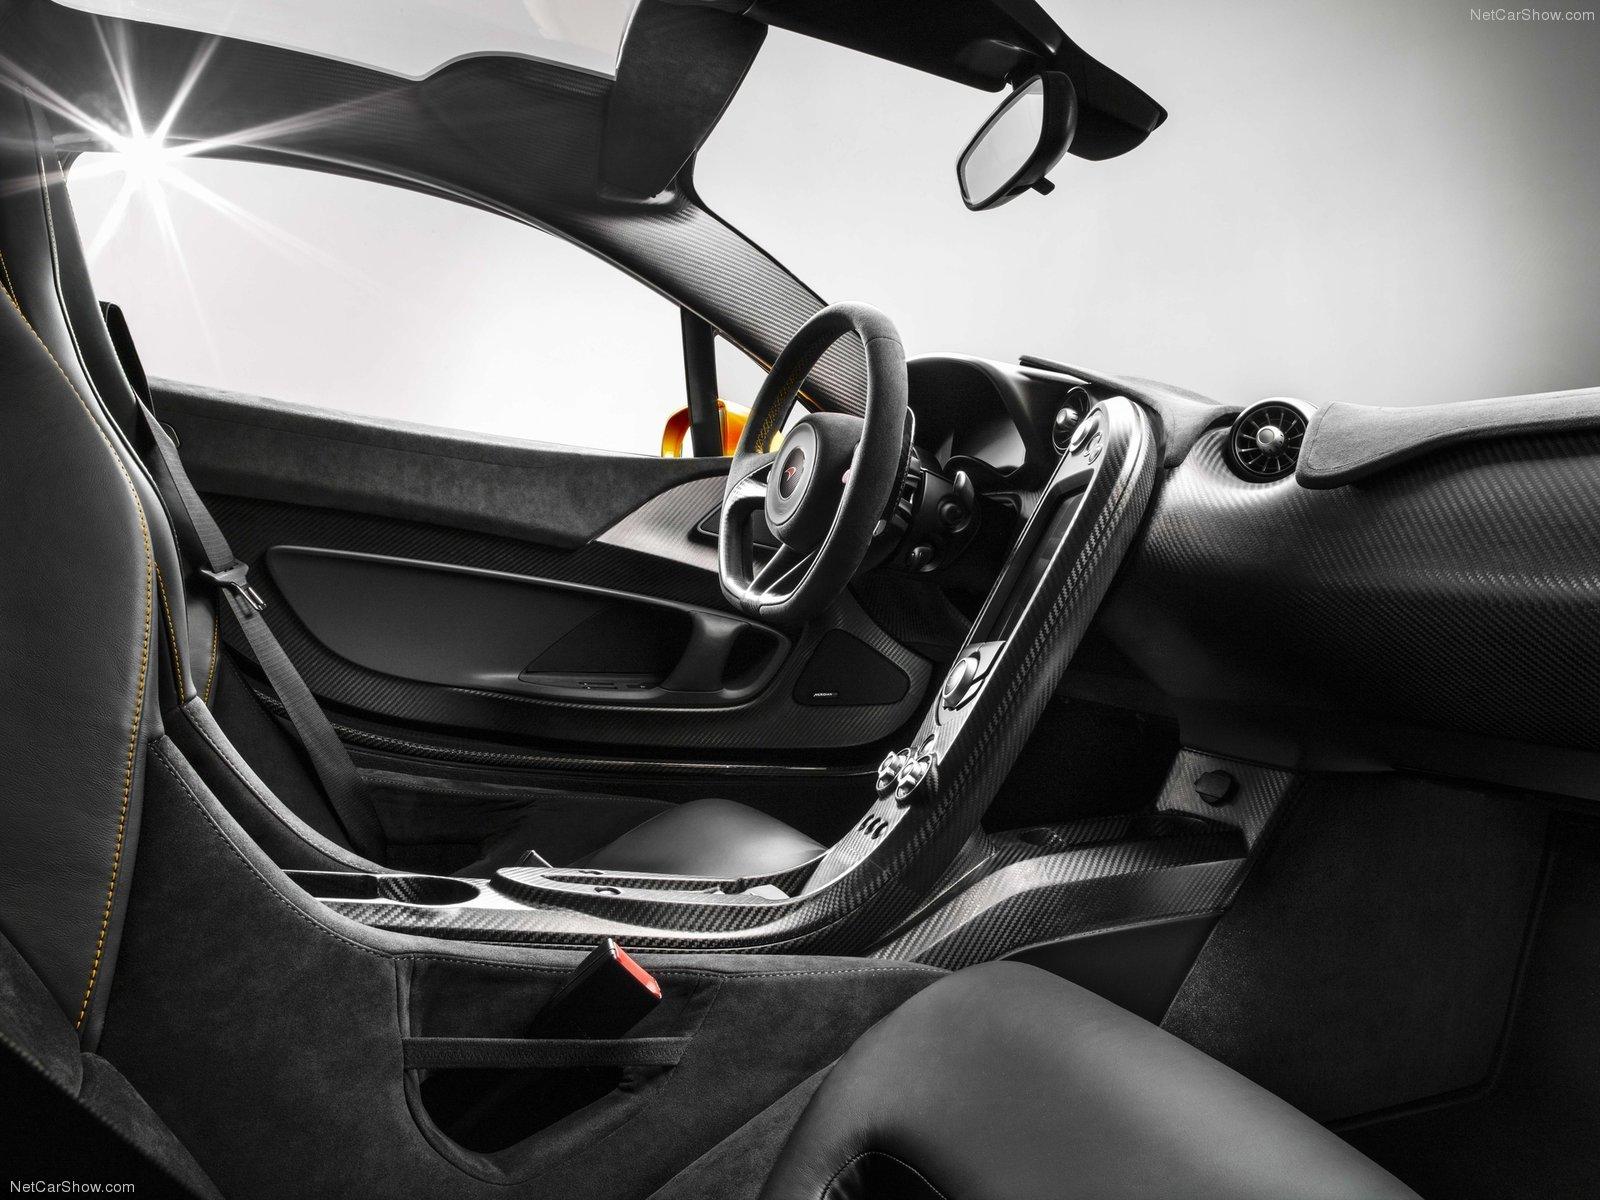 https://2.bp.blogspot.com/-QayxgWRJBbI/UYgVHy4XsOI/AAAAAAAAAYU/59sPHtvs5P4/s1600/2012-McLaren-P1-Concept-Interior.jpg